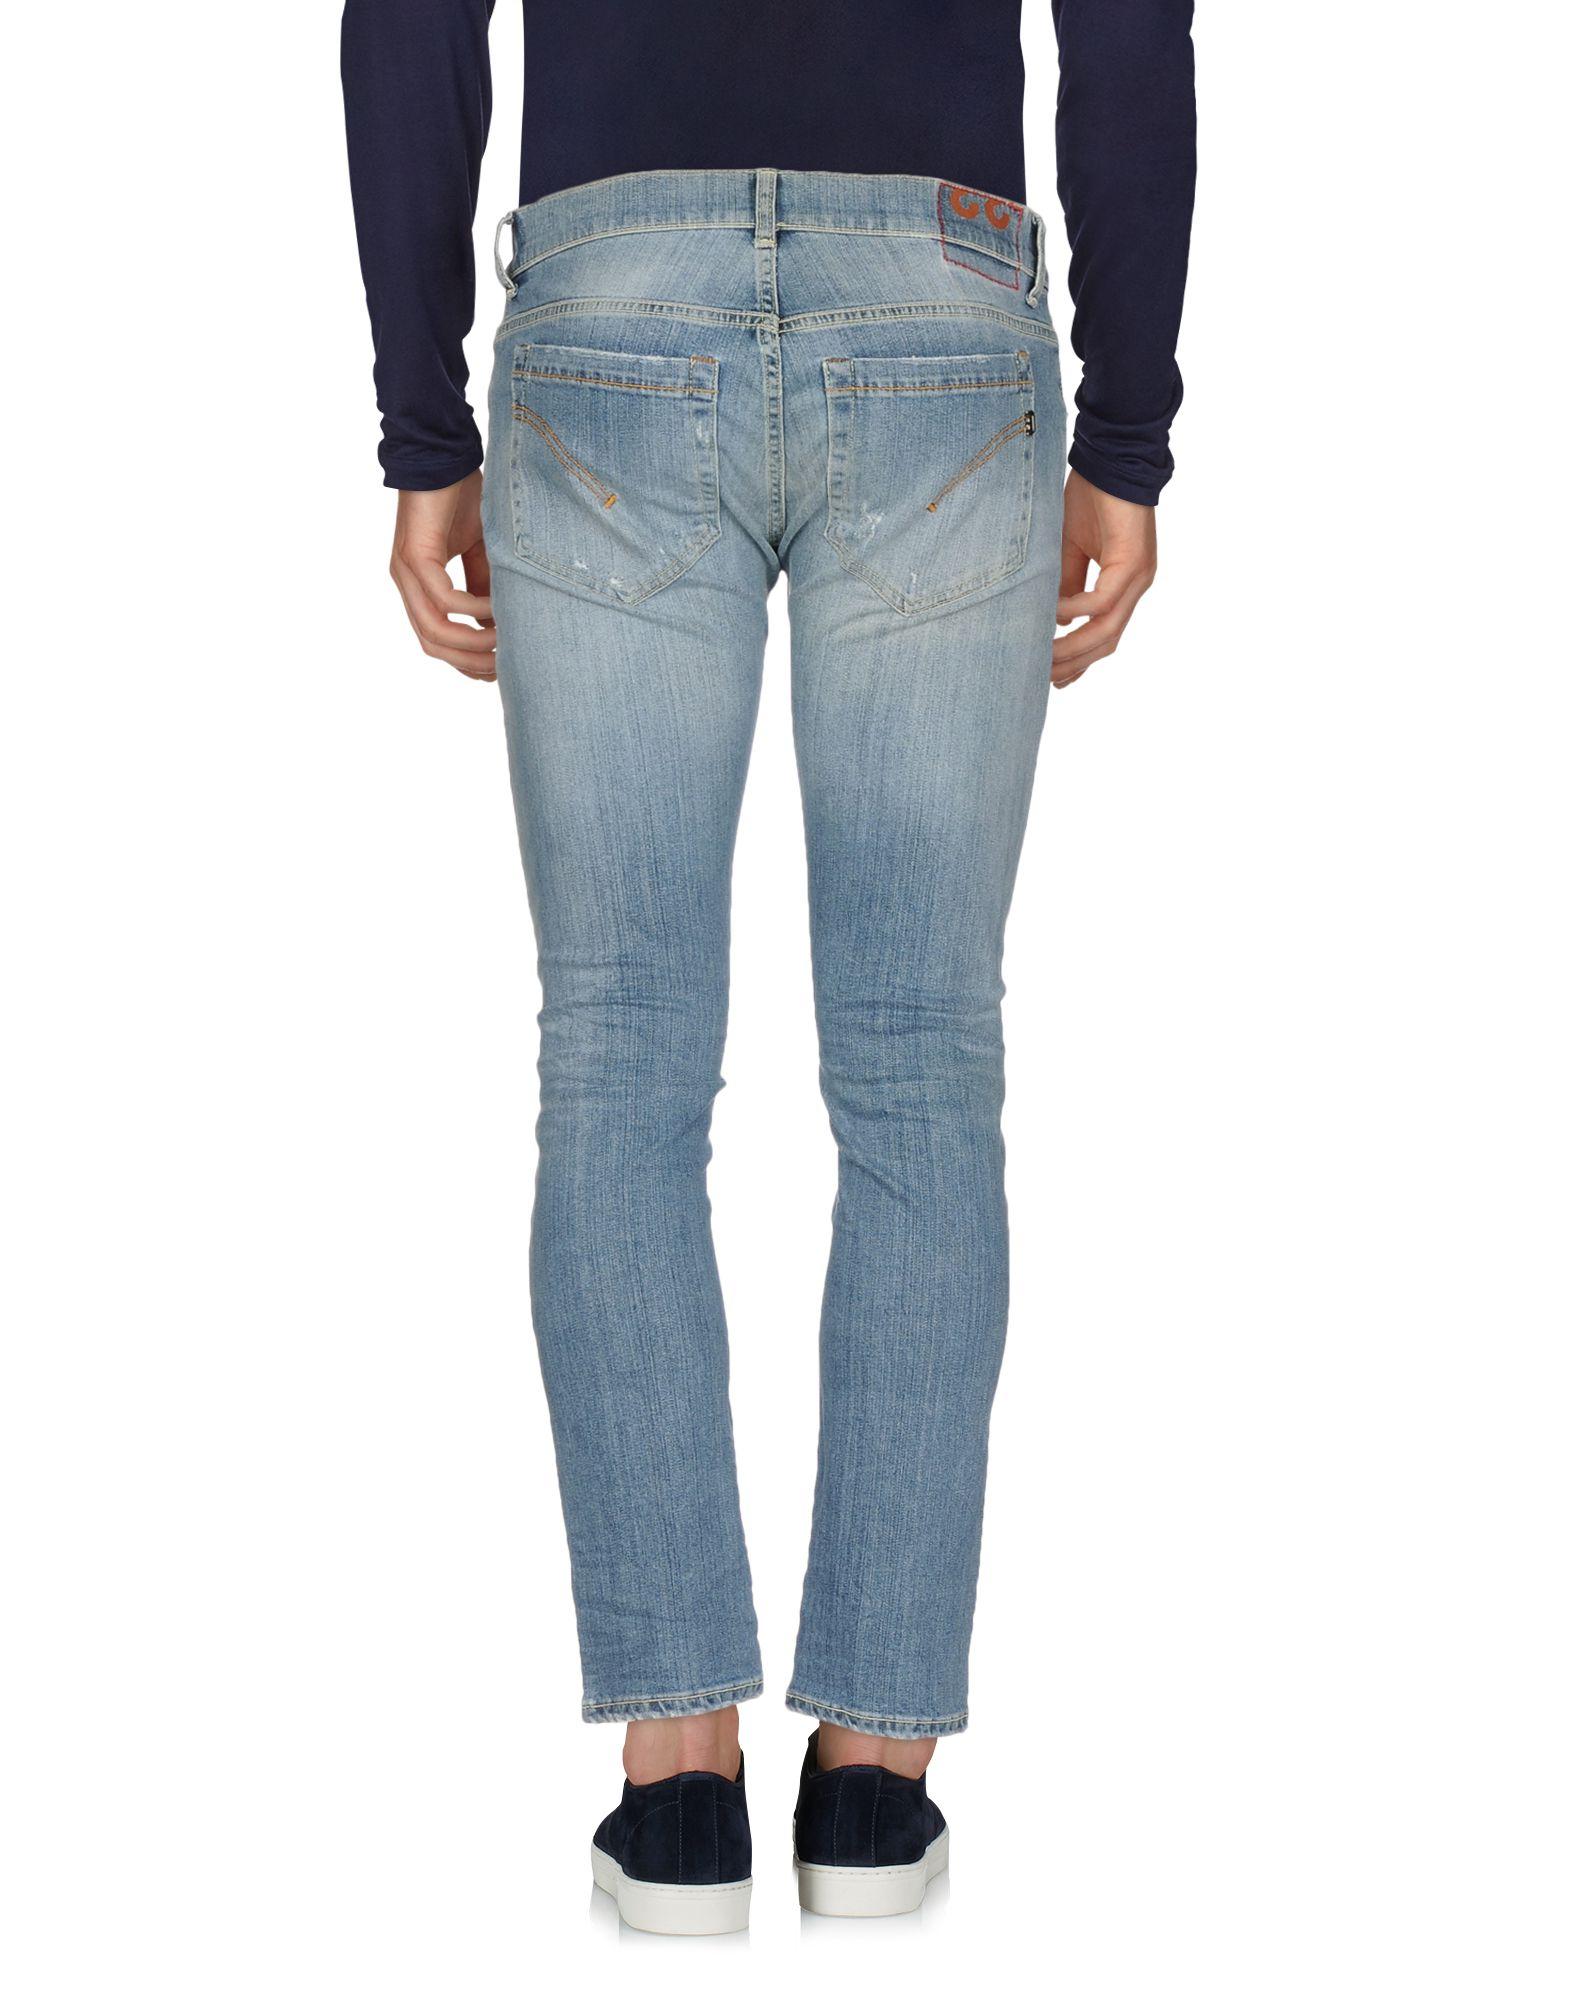 Pantaloni Dondup Jeans Dondup Pantaloni Uomo - 42672609QC 9c3753